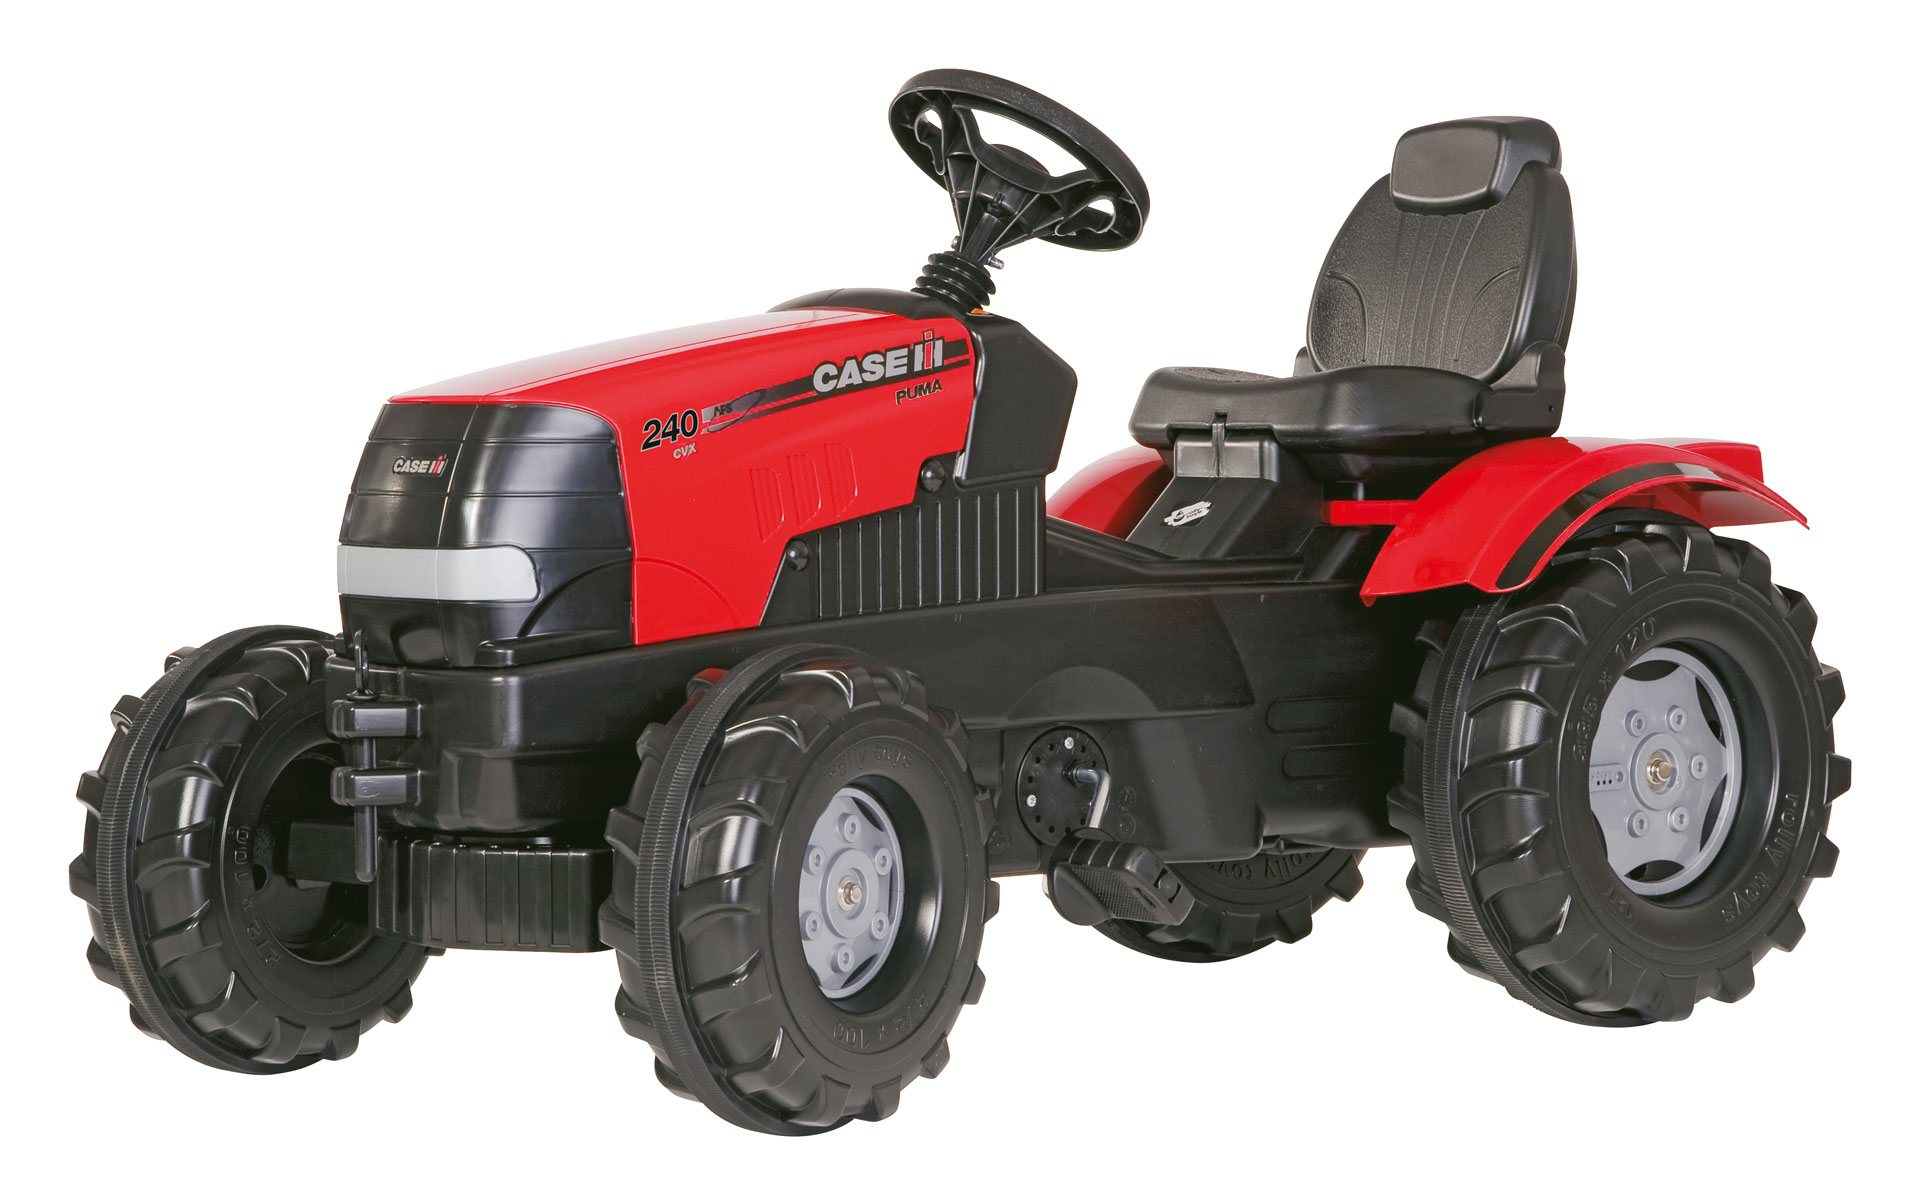 Tractor case III farmatrac puma